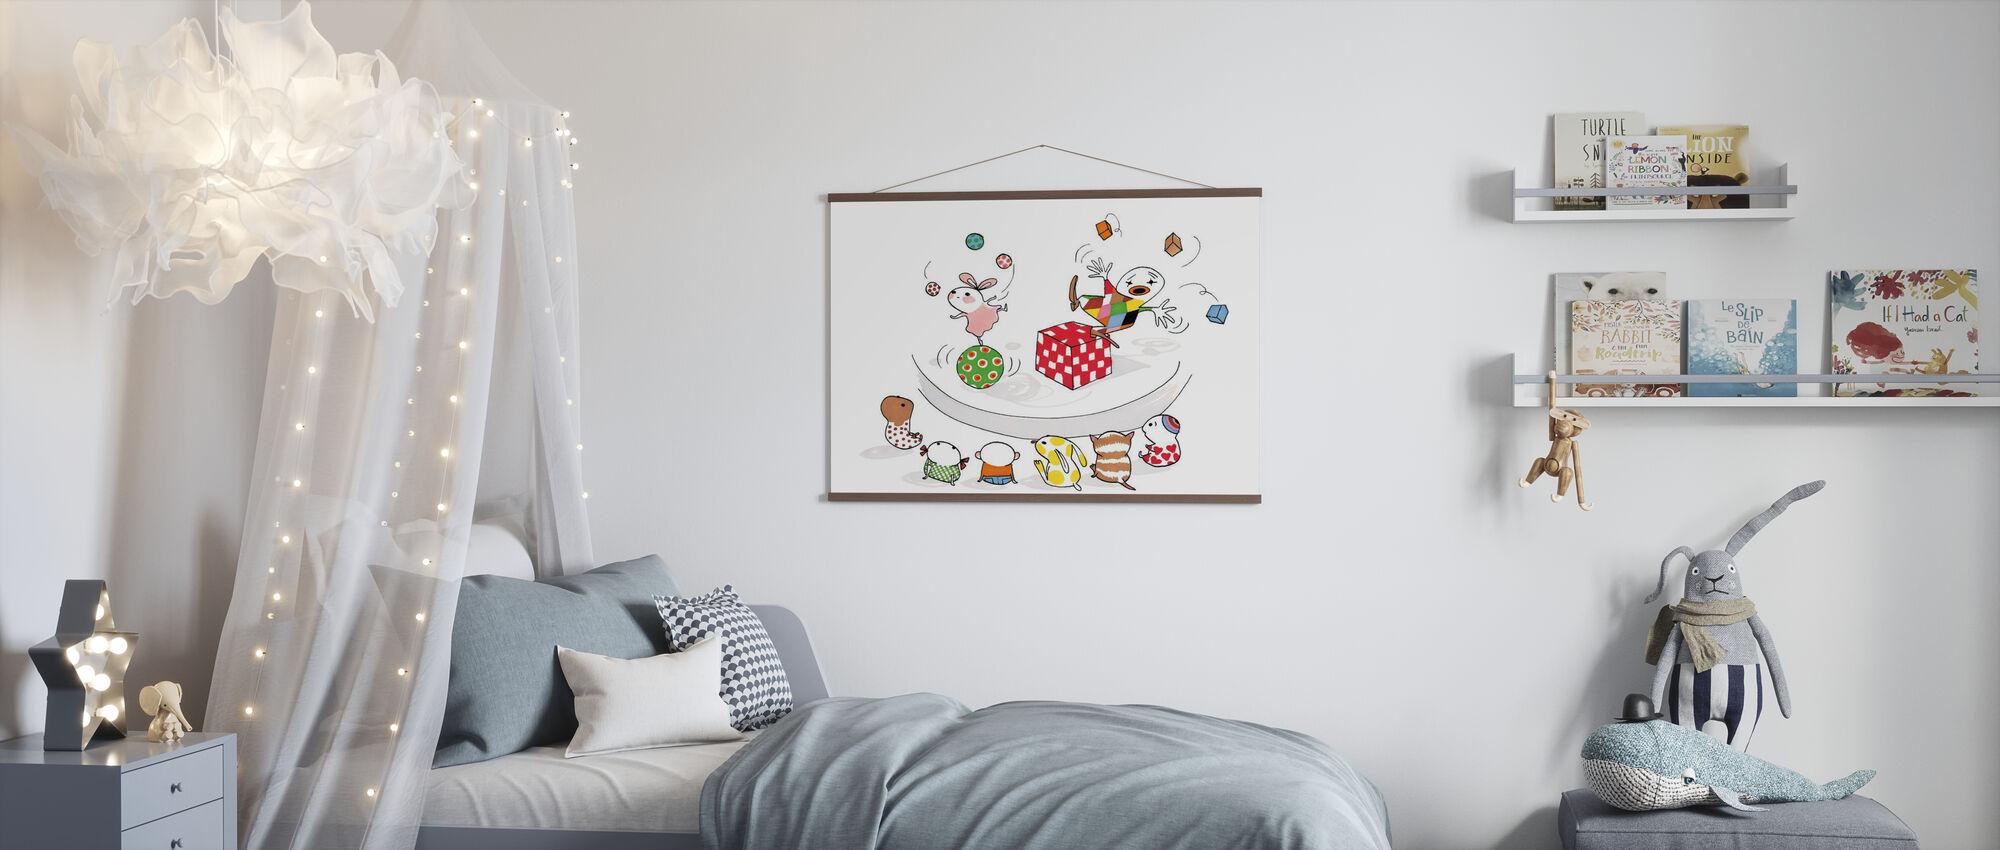 Jonglera - Poster - Camera dei bambini